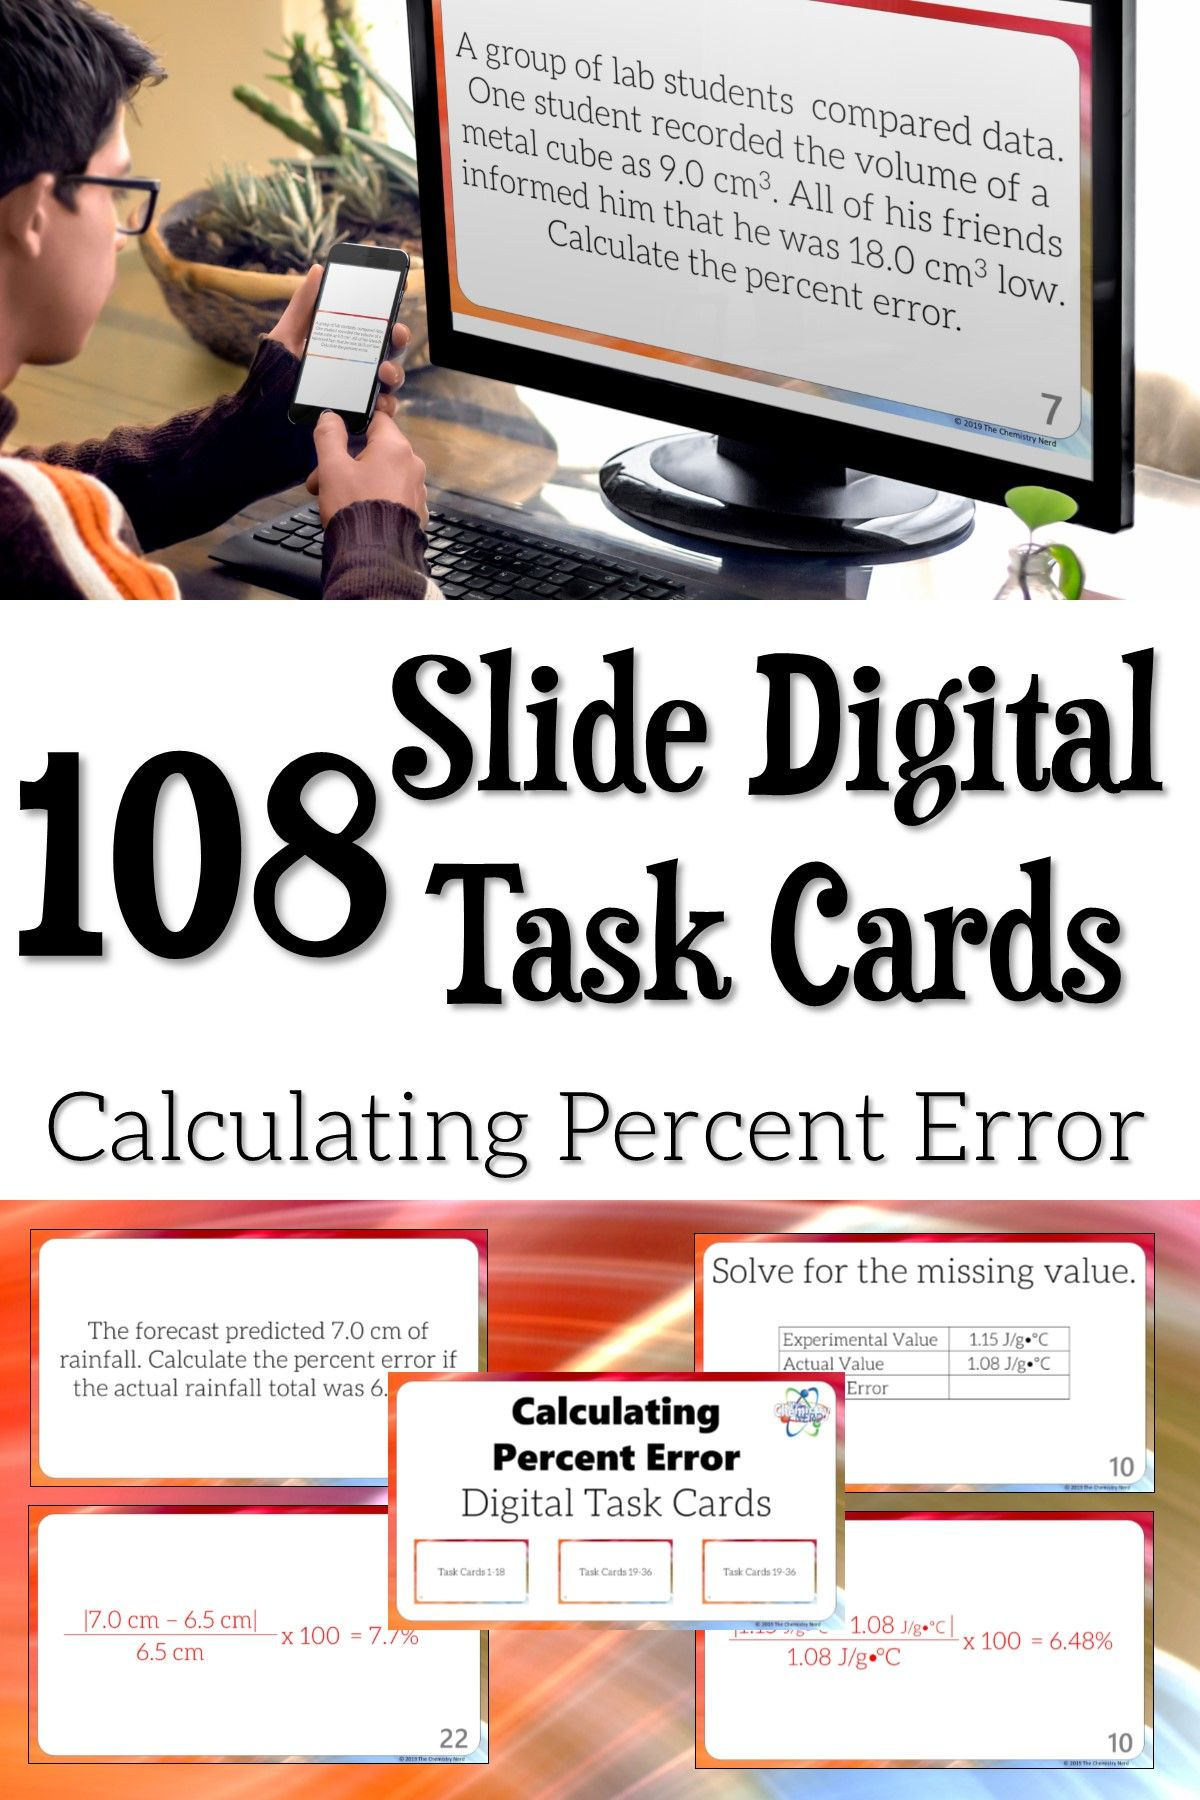 Calculating Percent Error Digital Task Cards